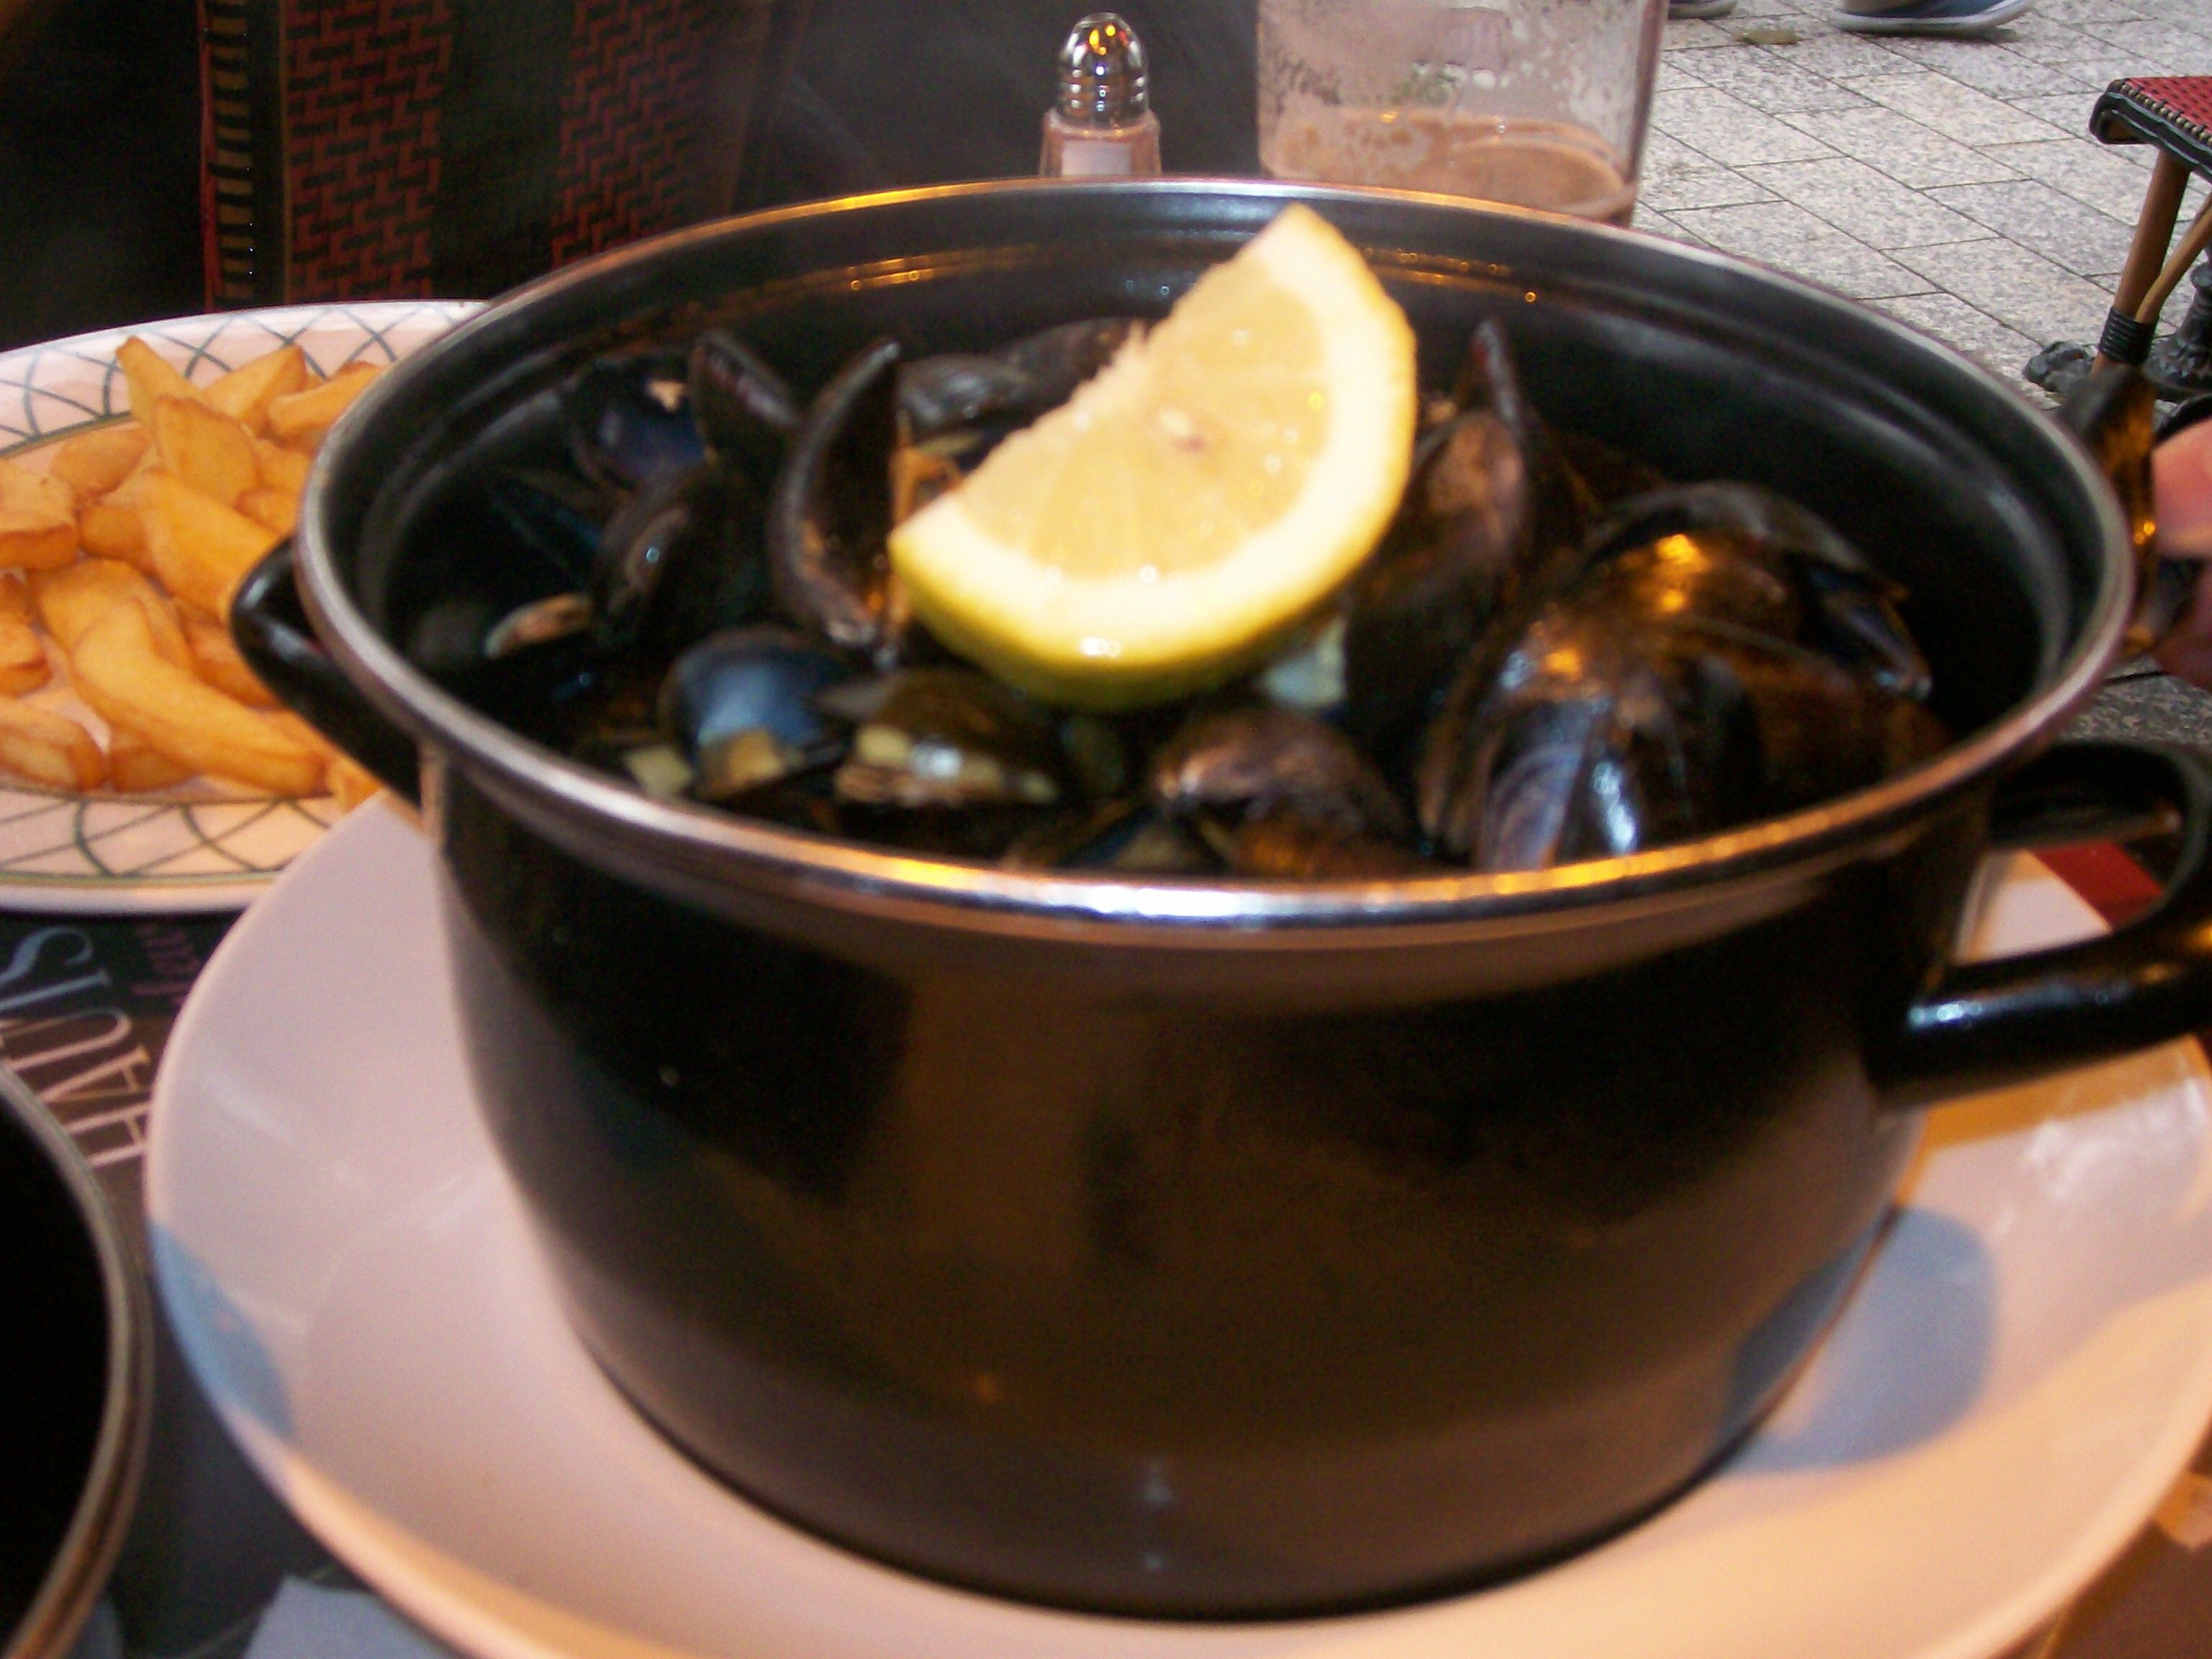 Mussel pot - delicious ...mmmmm